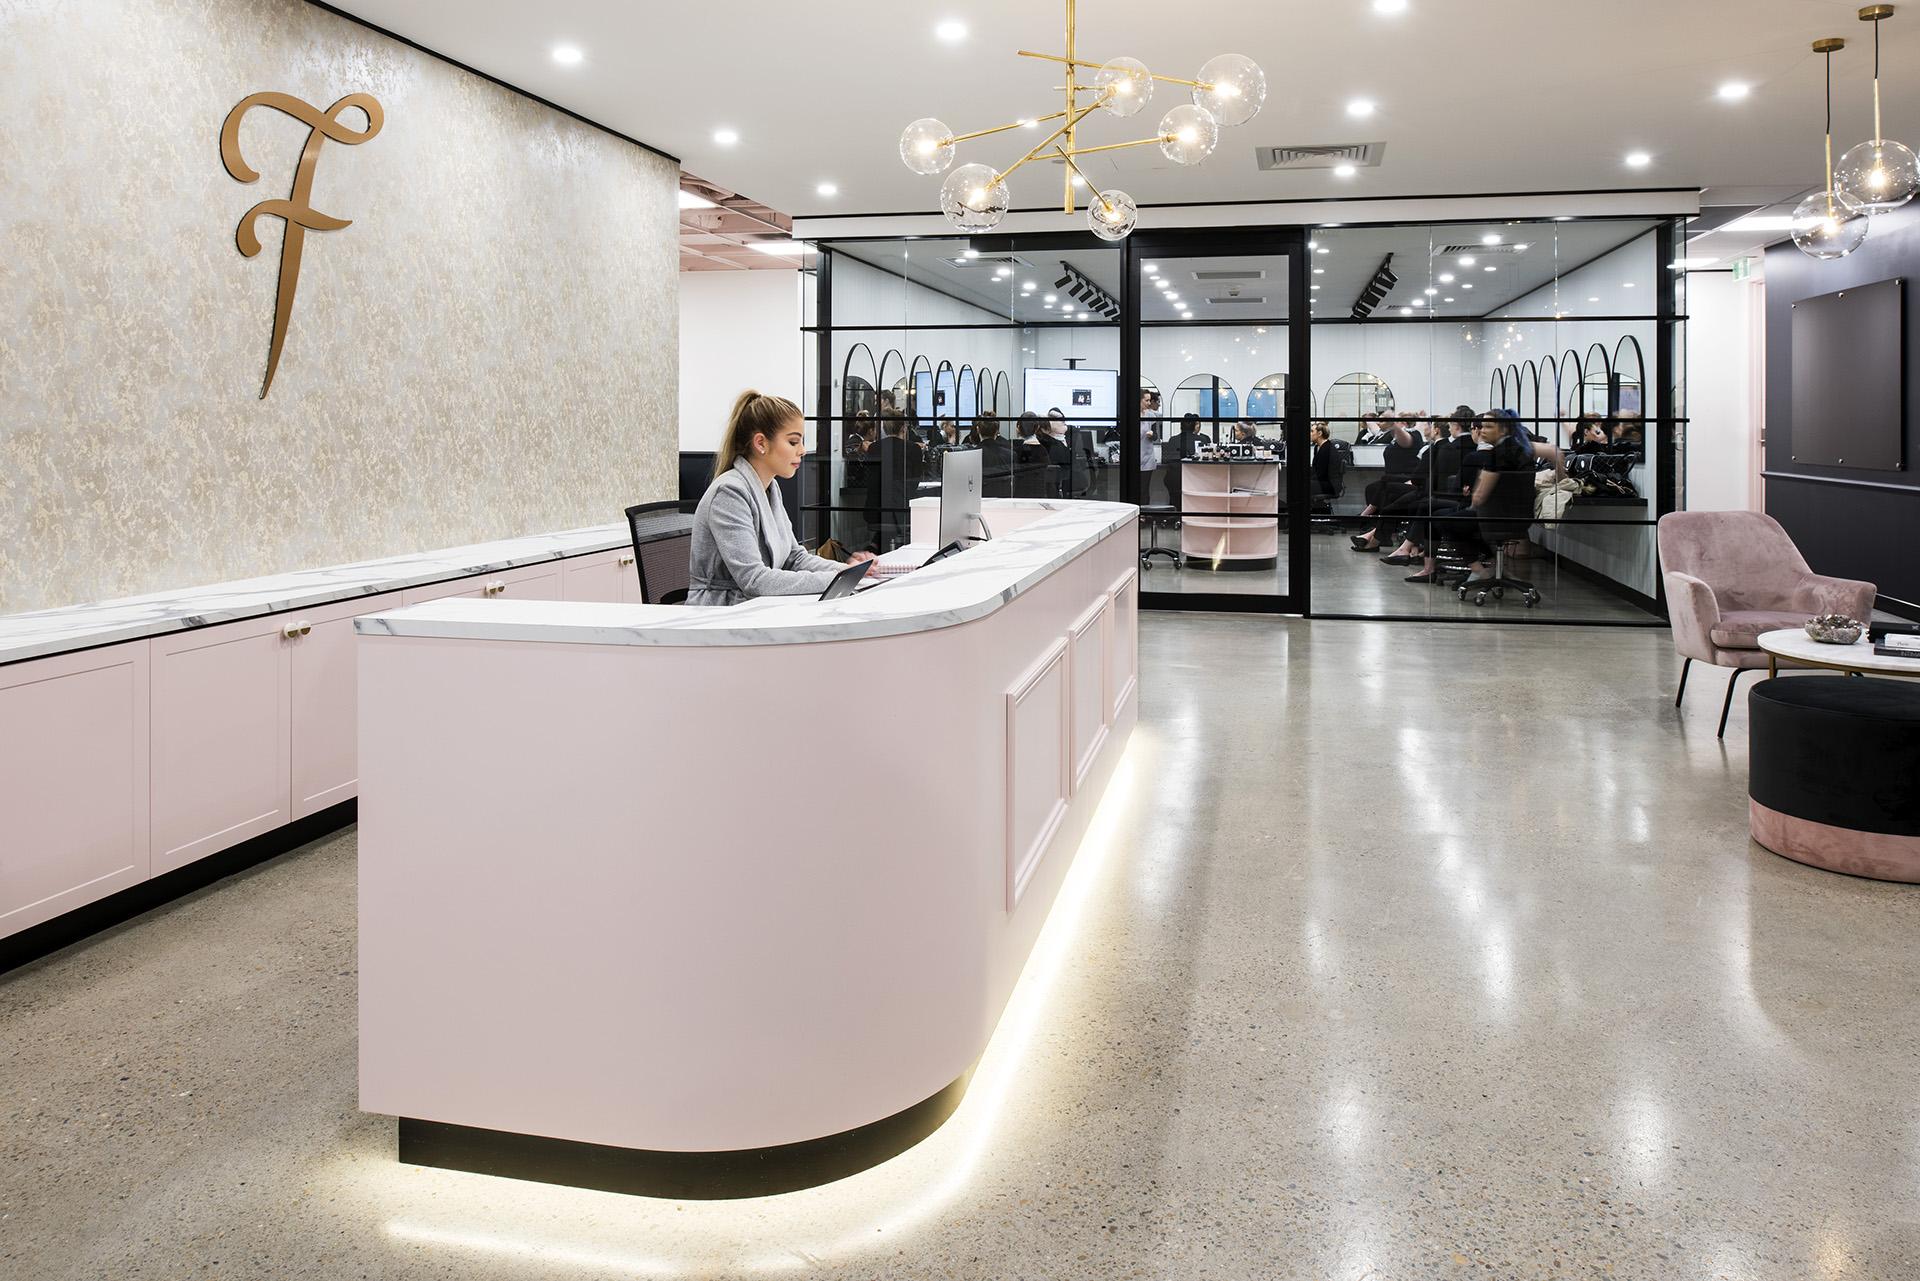 Archway-French Office Design Brisbane- Reception Area 3.jpg